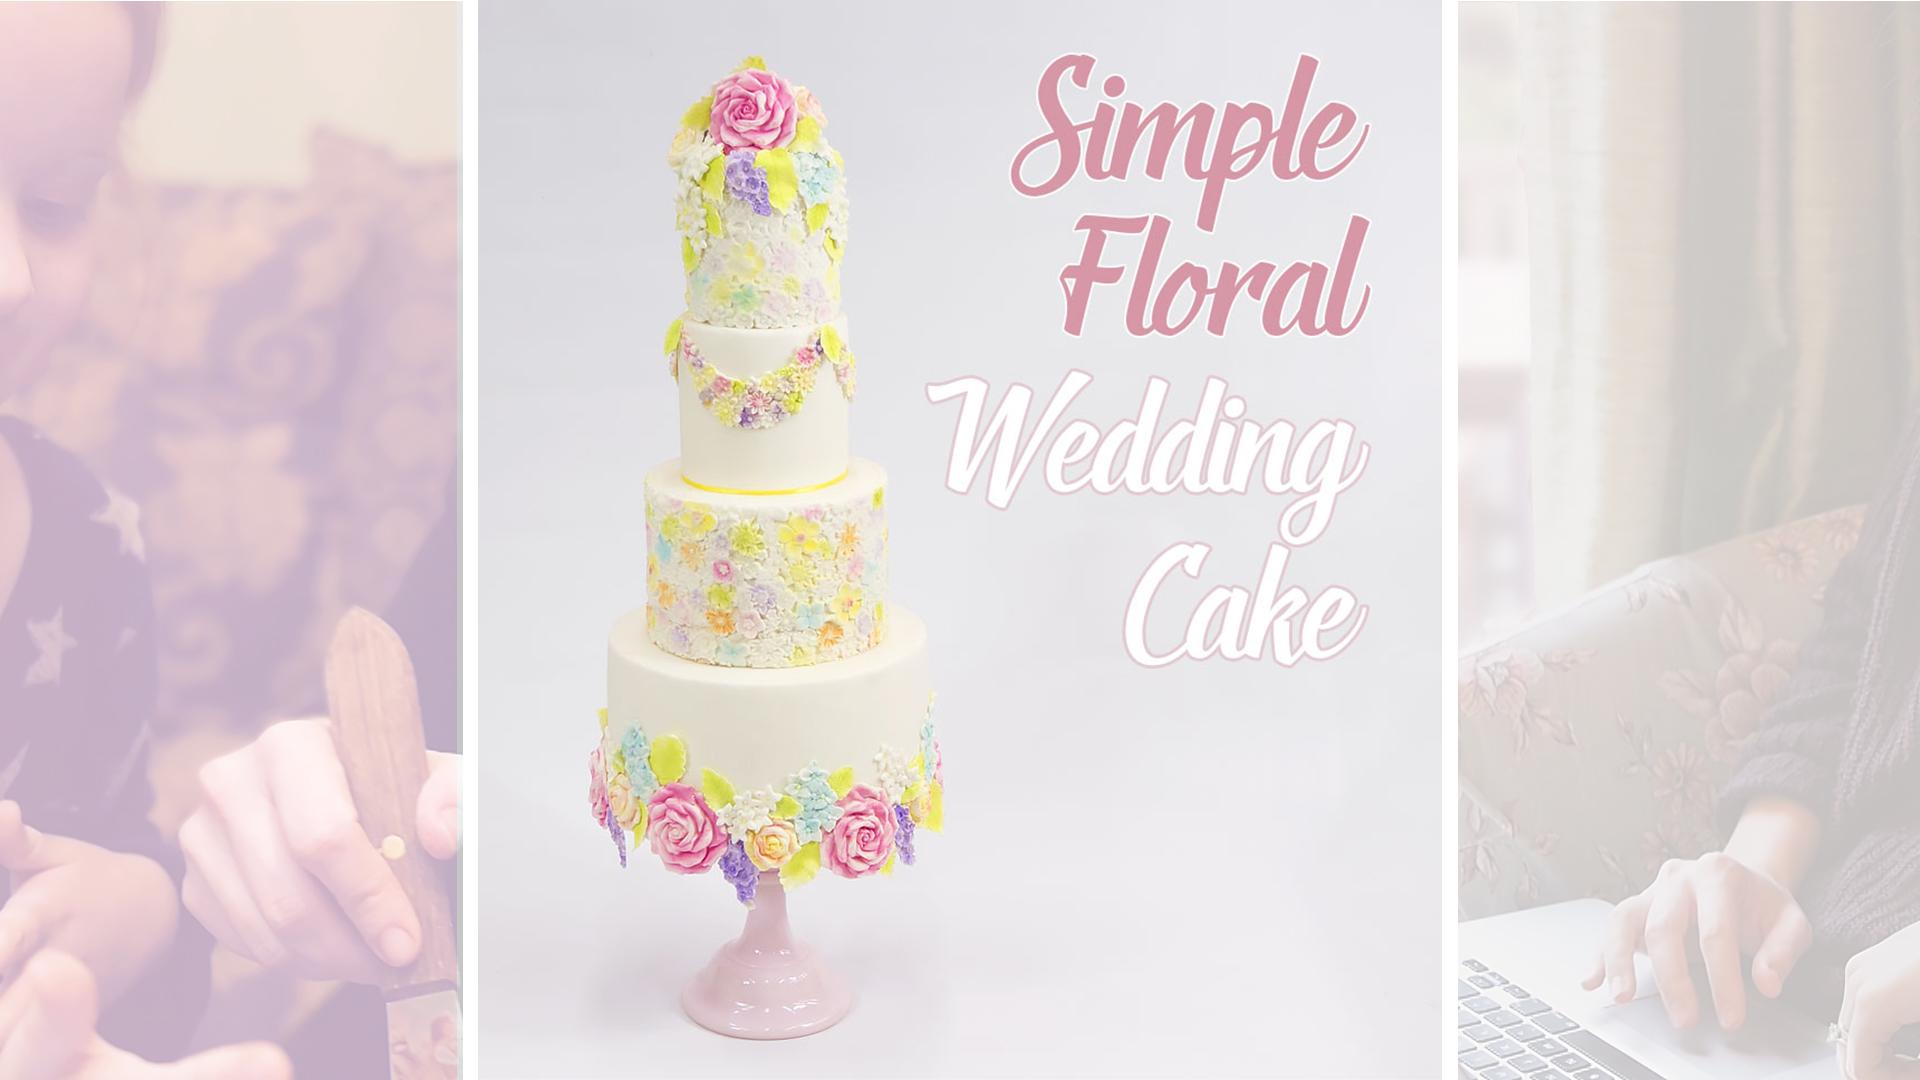 Simple Floral Wedding Cake Cakeflix